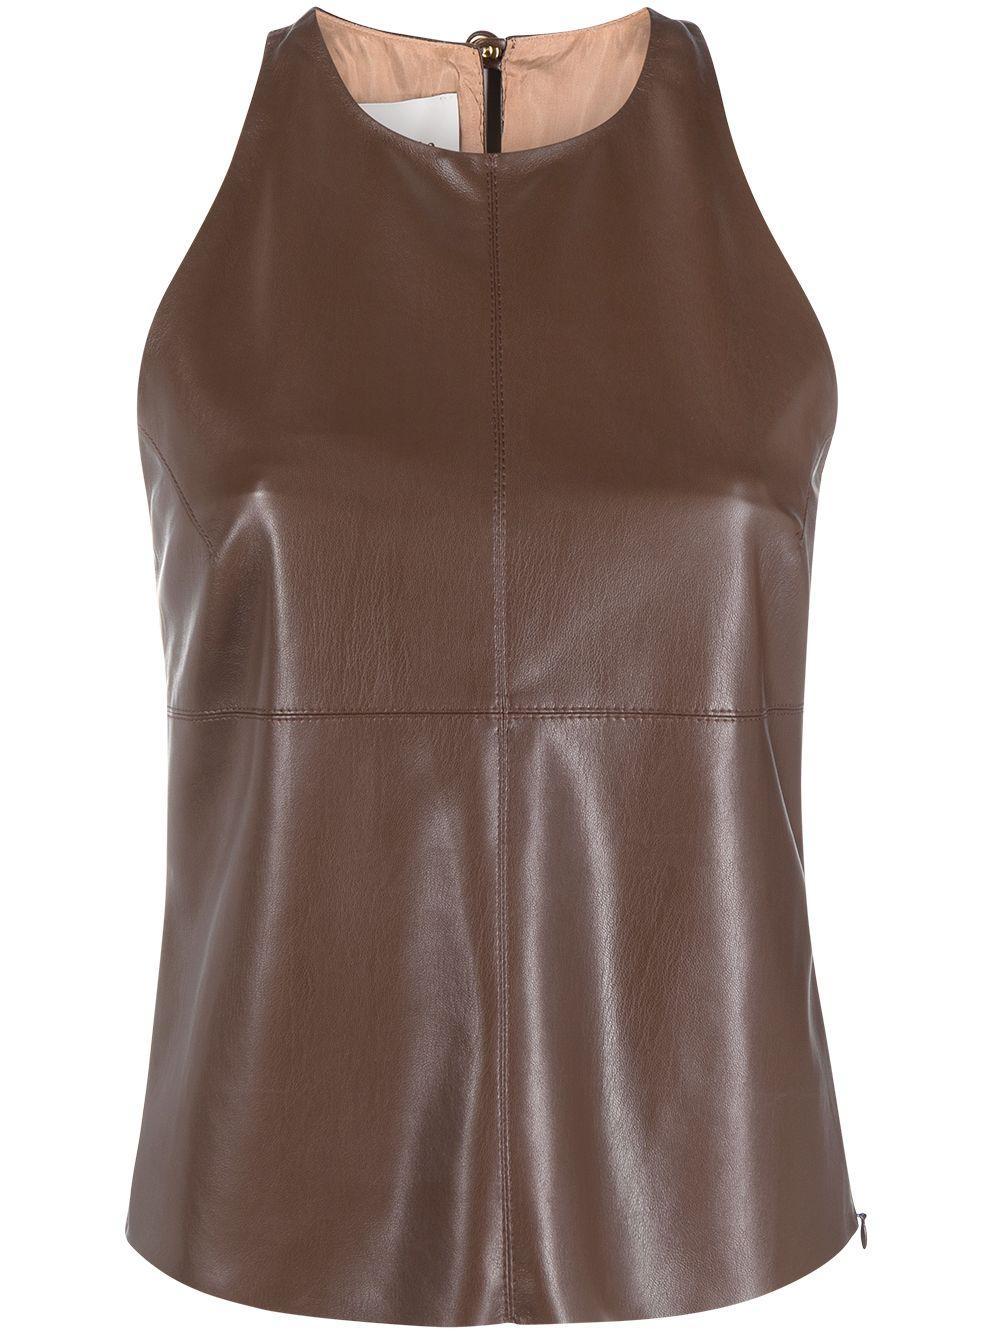 Teza Vegan Leather Top Item # NW2PFTP01678